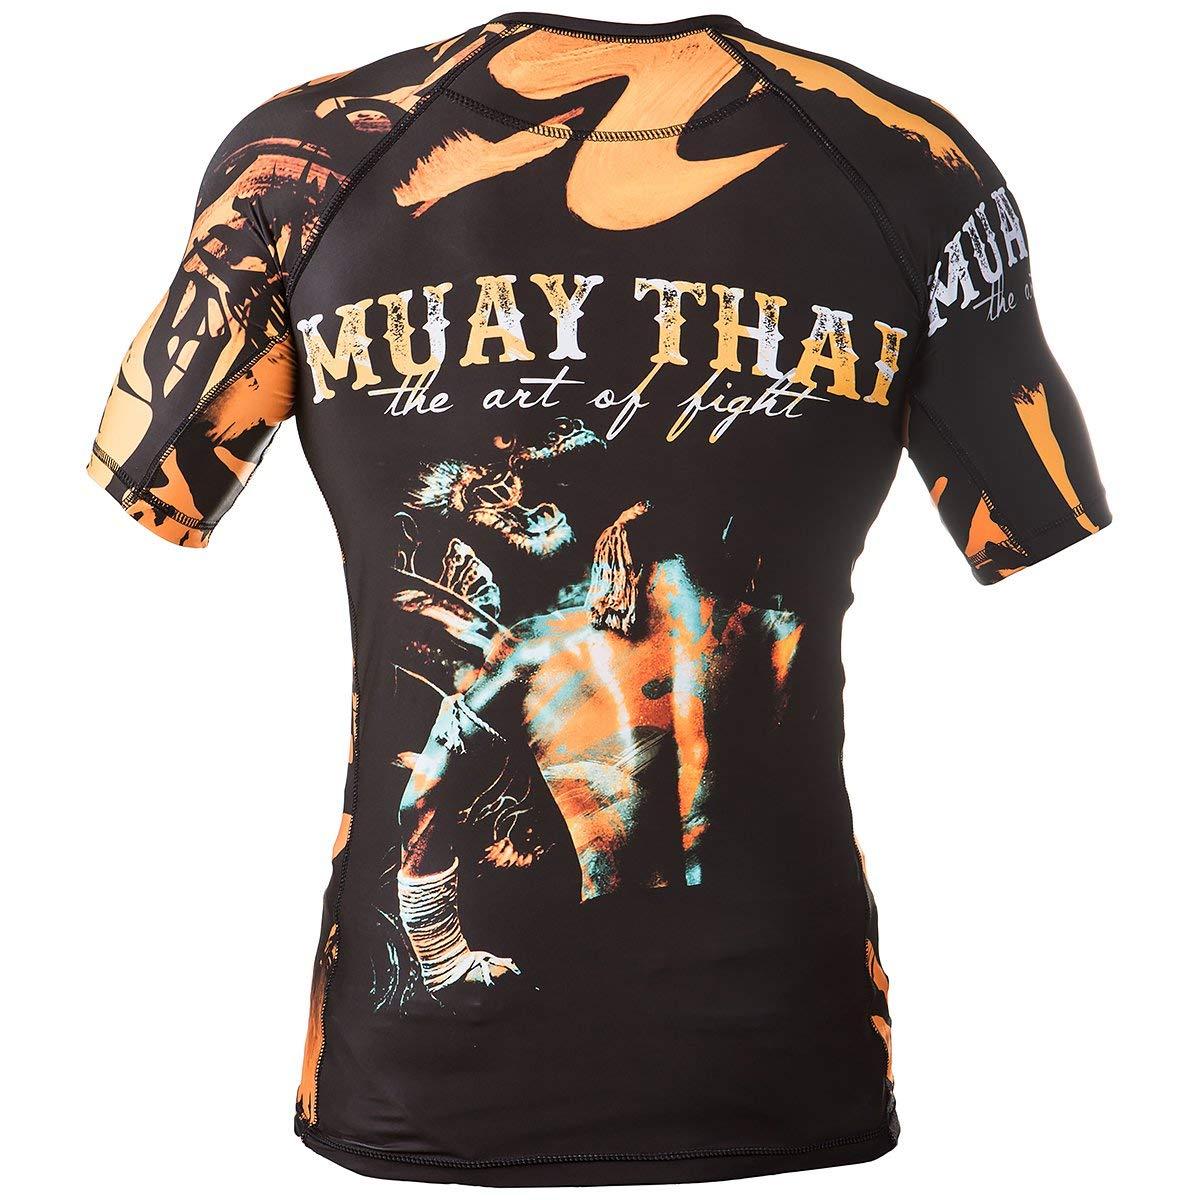 Rule Out Manga Corta Camiseta De Neopreno camiseta Muay Thai The Art Of Fight Gimnasio entrenamiento Fitness Correr Ciclismo Compresi/ón camiseta MMA Ropa para combate